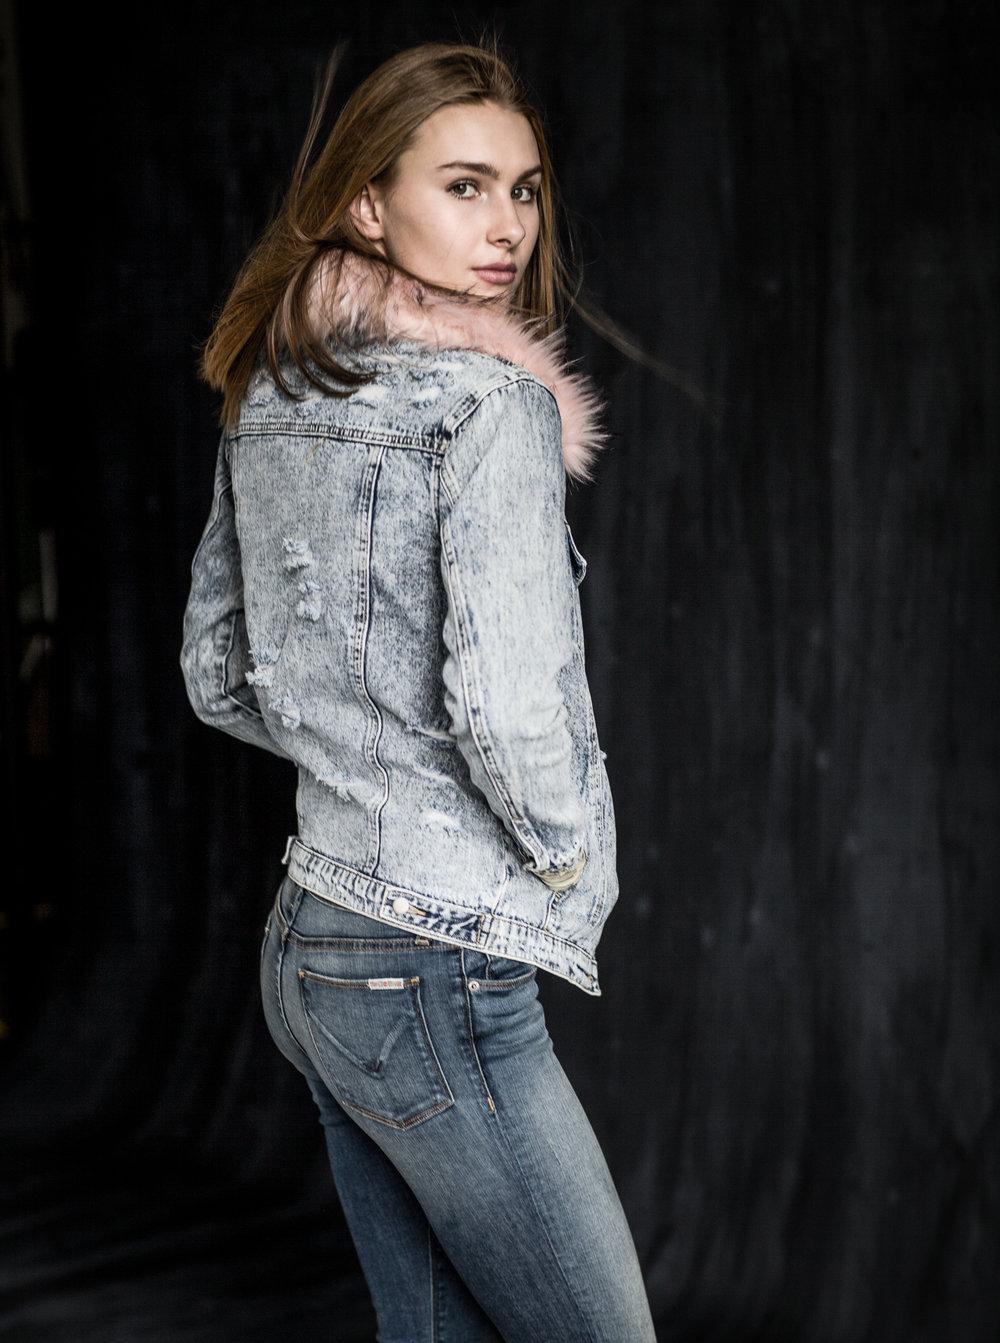 Andrea in denim. Jacket: Honey Punch  Jeans: Hudson